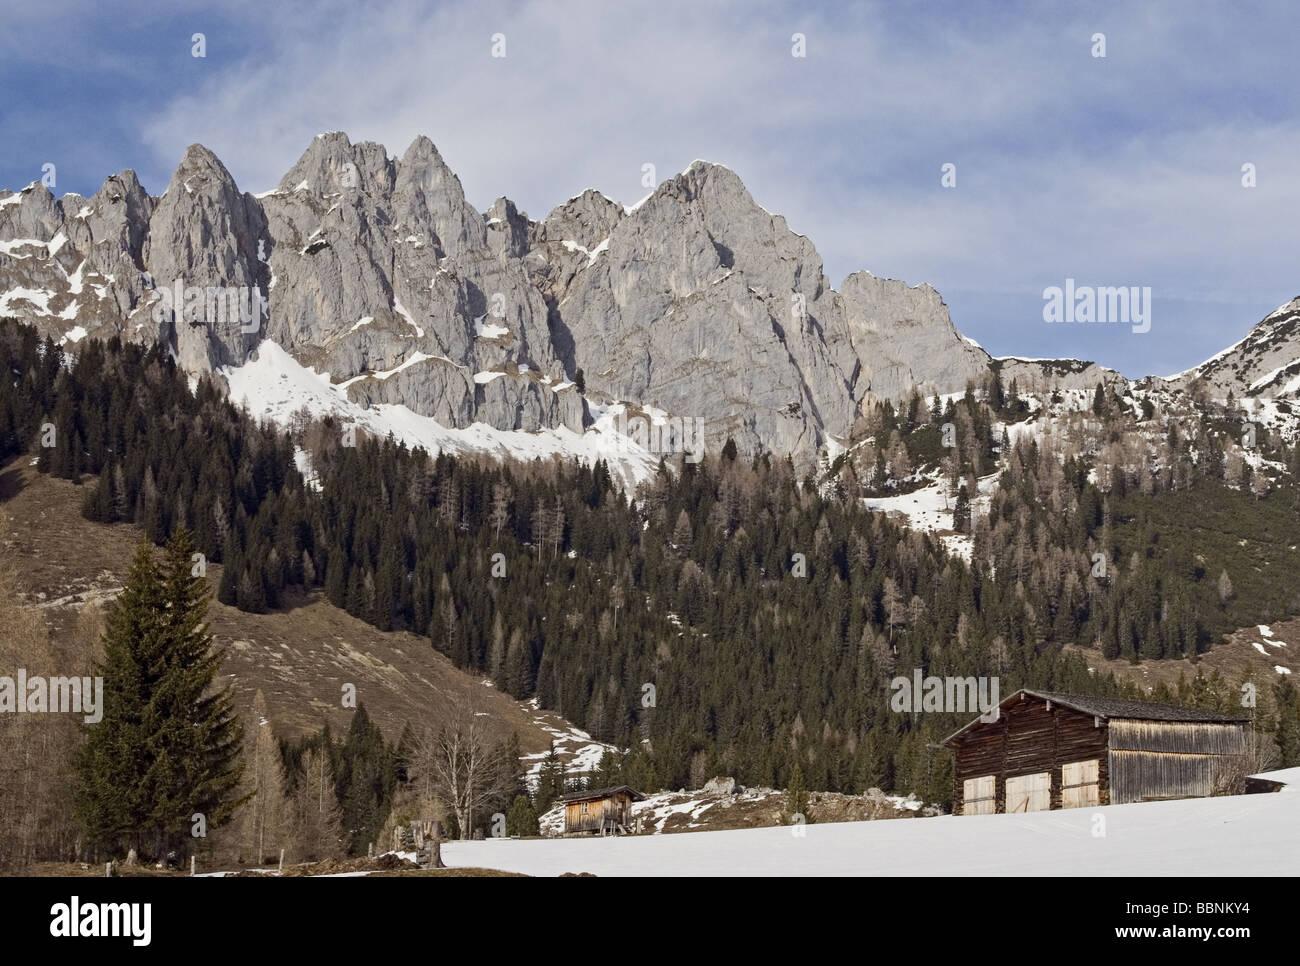 Geografia / viaggi, Salisburgo, Austria Membro, paesaggi, Filzmoos, Additional-Rights-Clearance-Info-Not-Available Immagini Stock